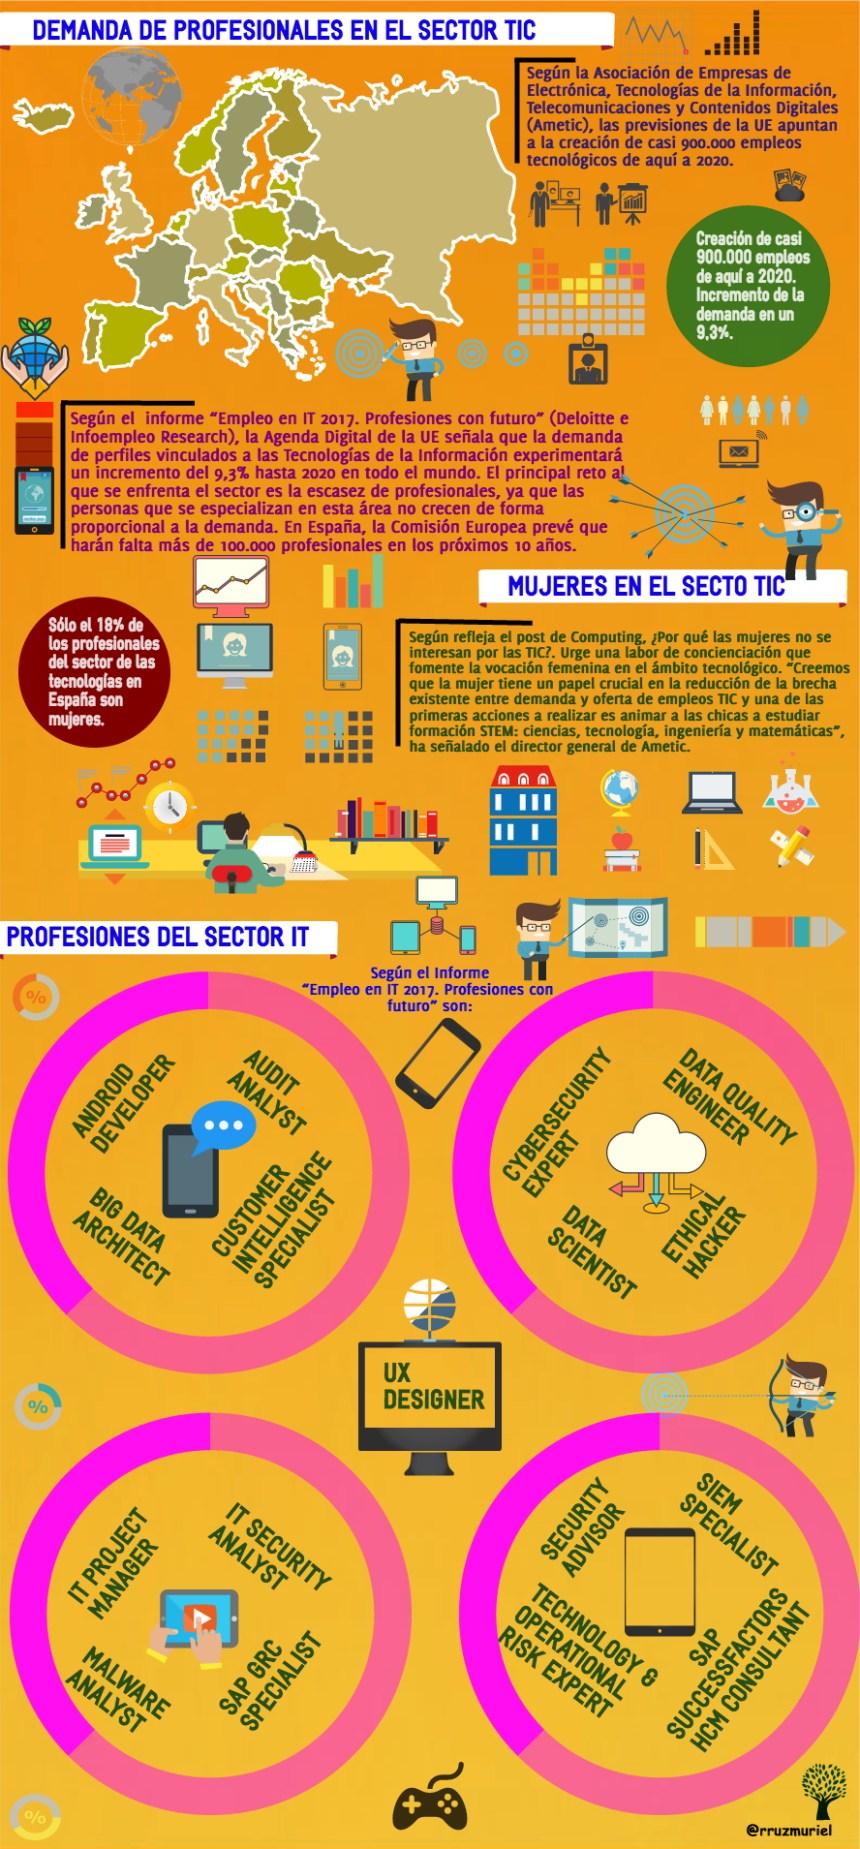 Demanda de profesionales del sector TIC